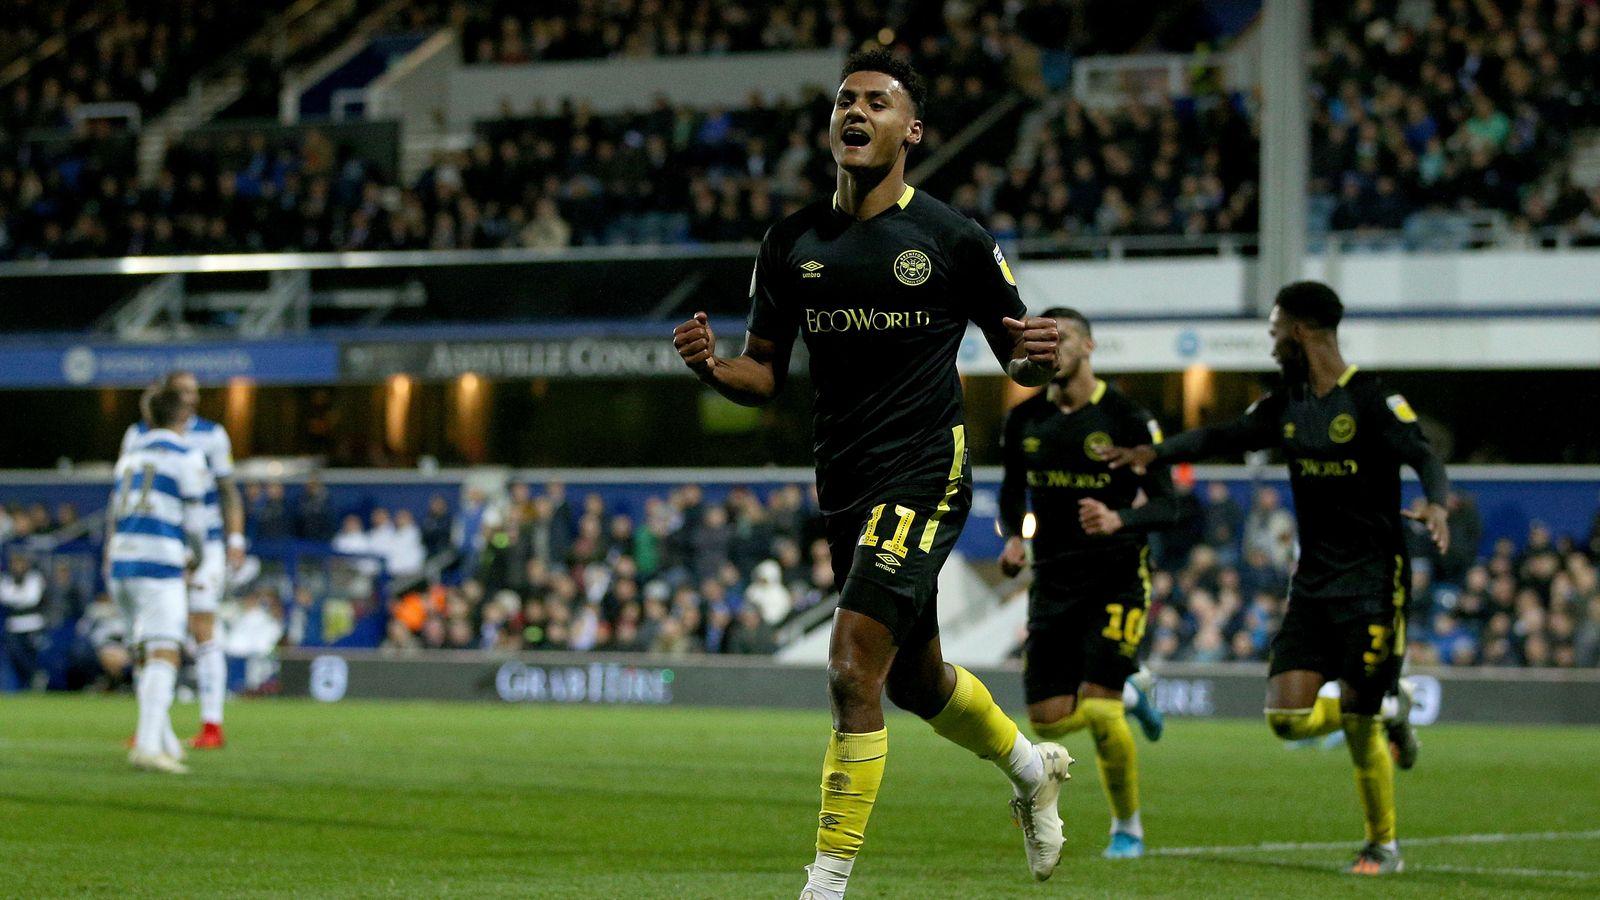 Brentford 1-0 Reading: Ollie Watkins fires Bees to victory